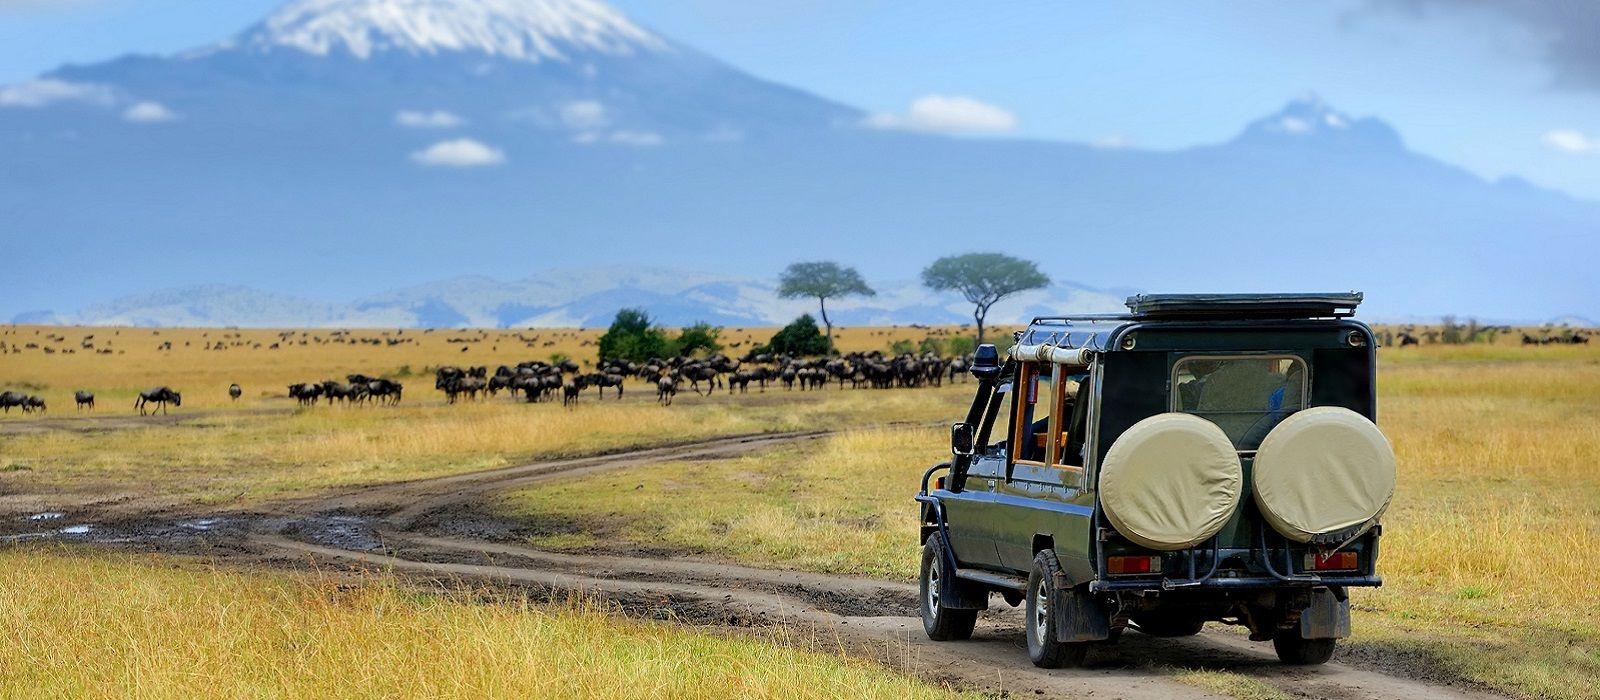 Atua Enkop Exclusive: Kenya Safari and Beach Break Tour Trip 2